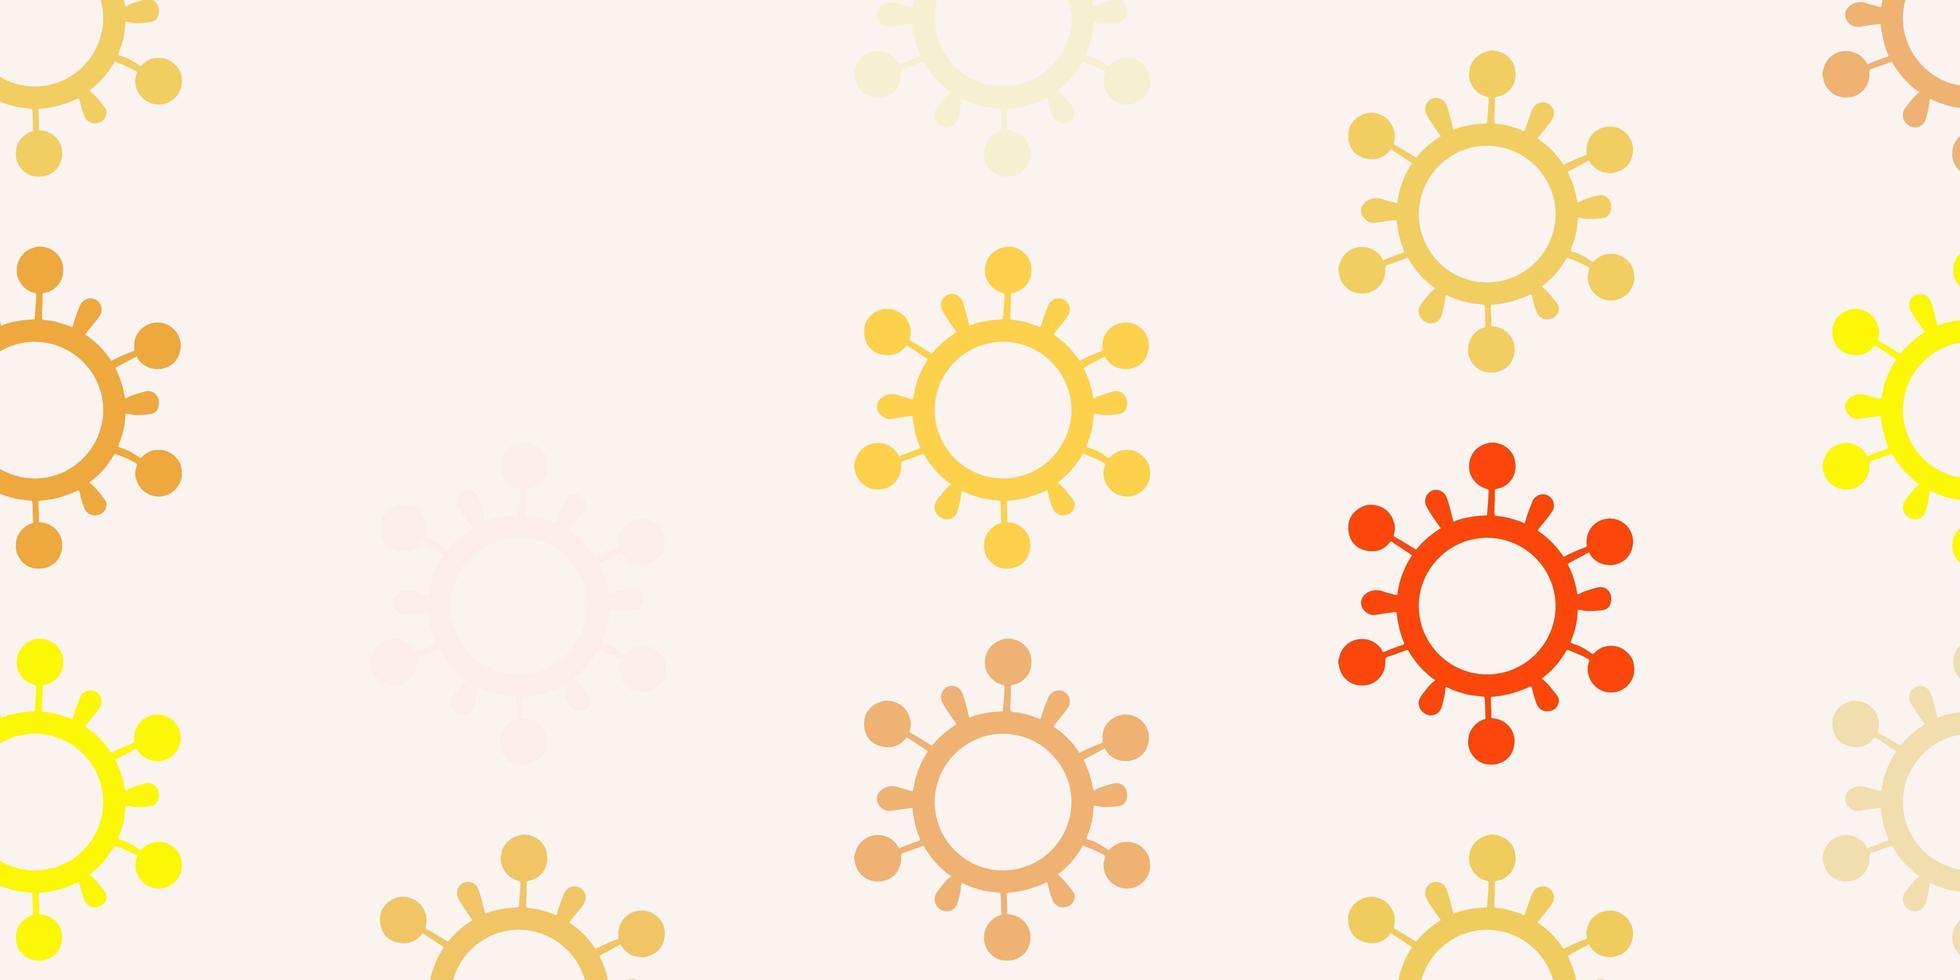 hellrosa, gelbes Vektormuster mit Coronavirus-Elementen. vektor